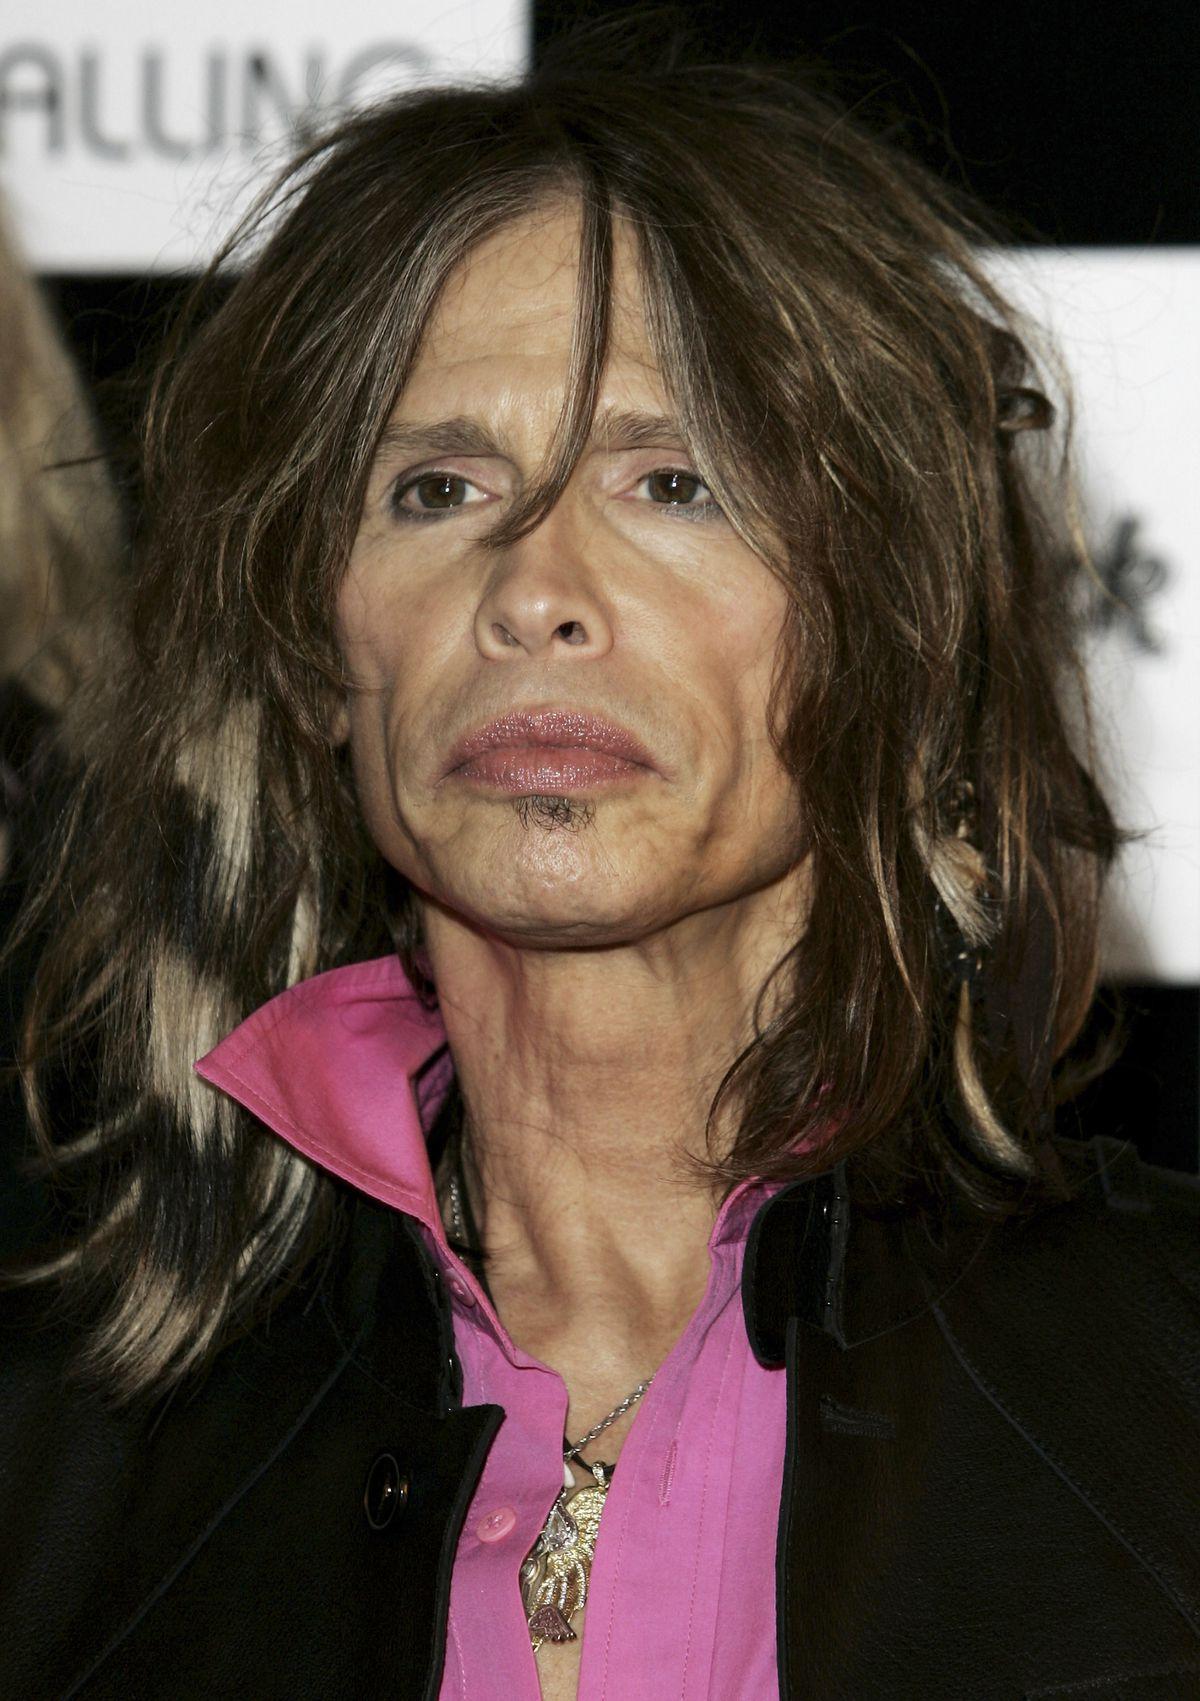 Aerosmith Photocall At The Hard Rock Cafe